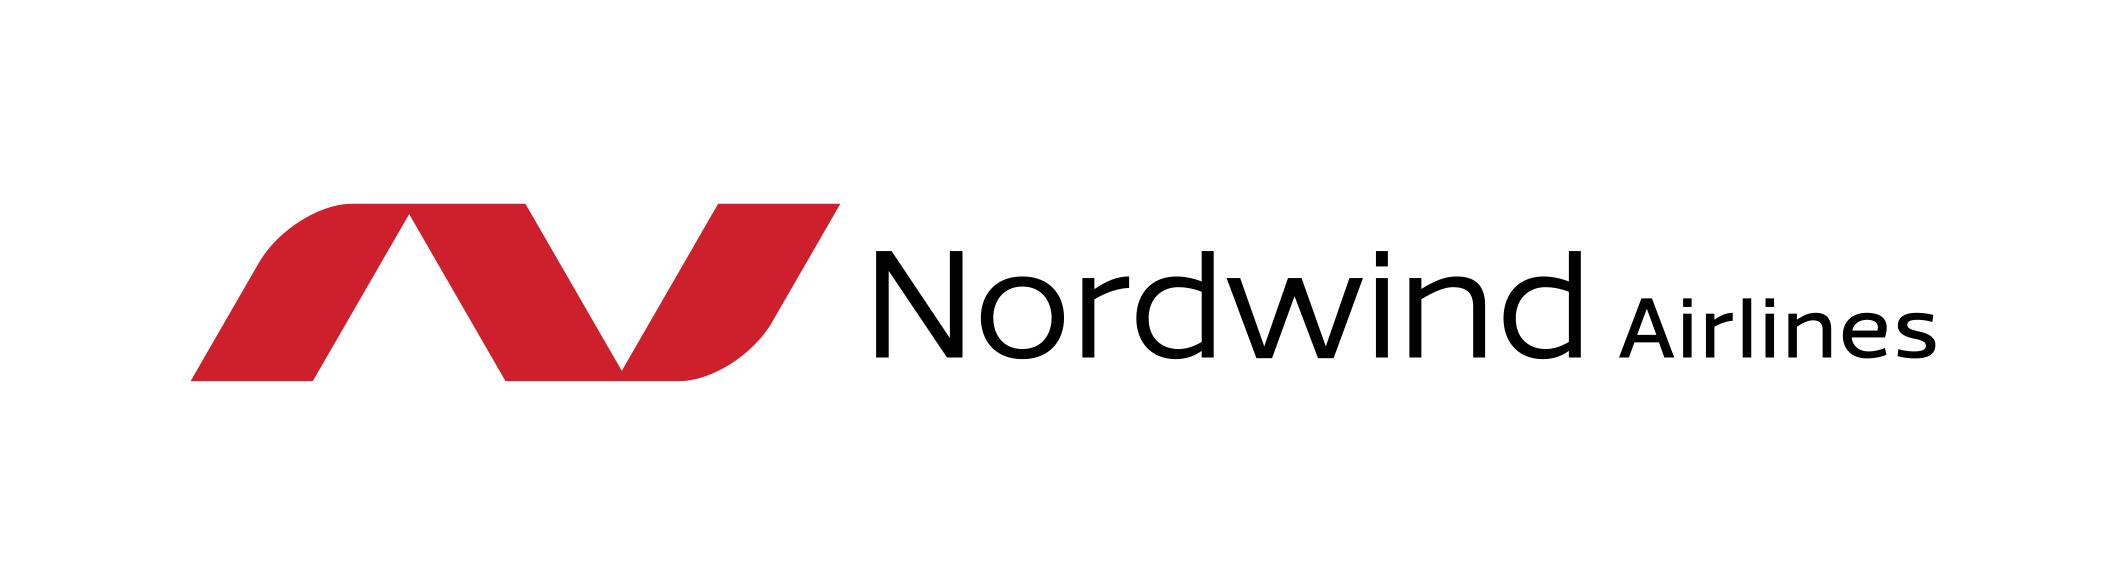 NORD WIND LLC